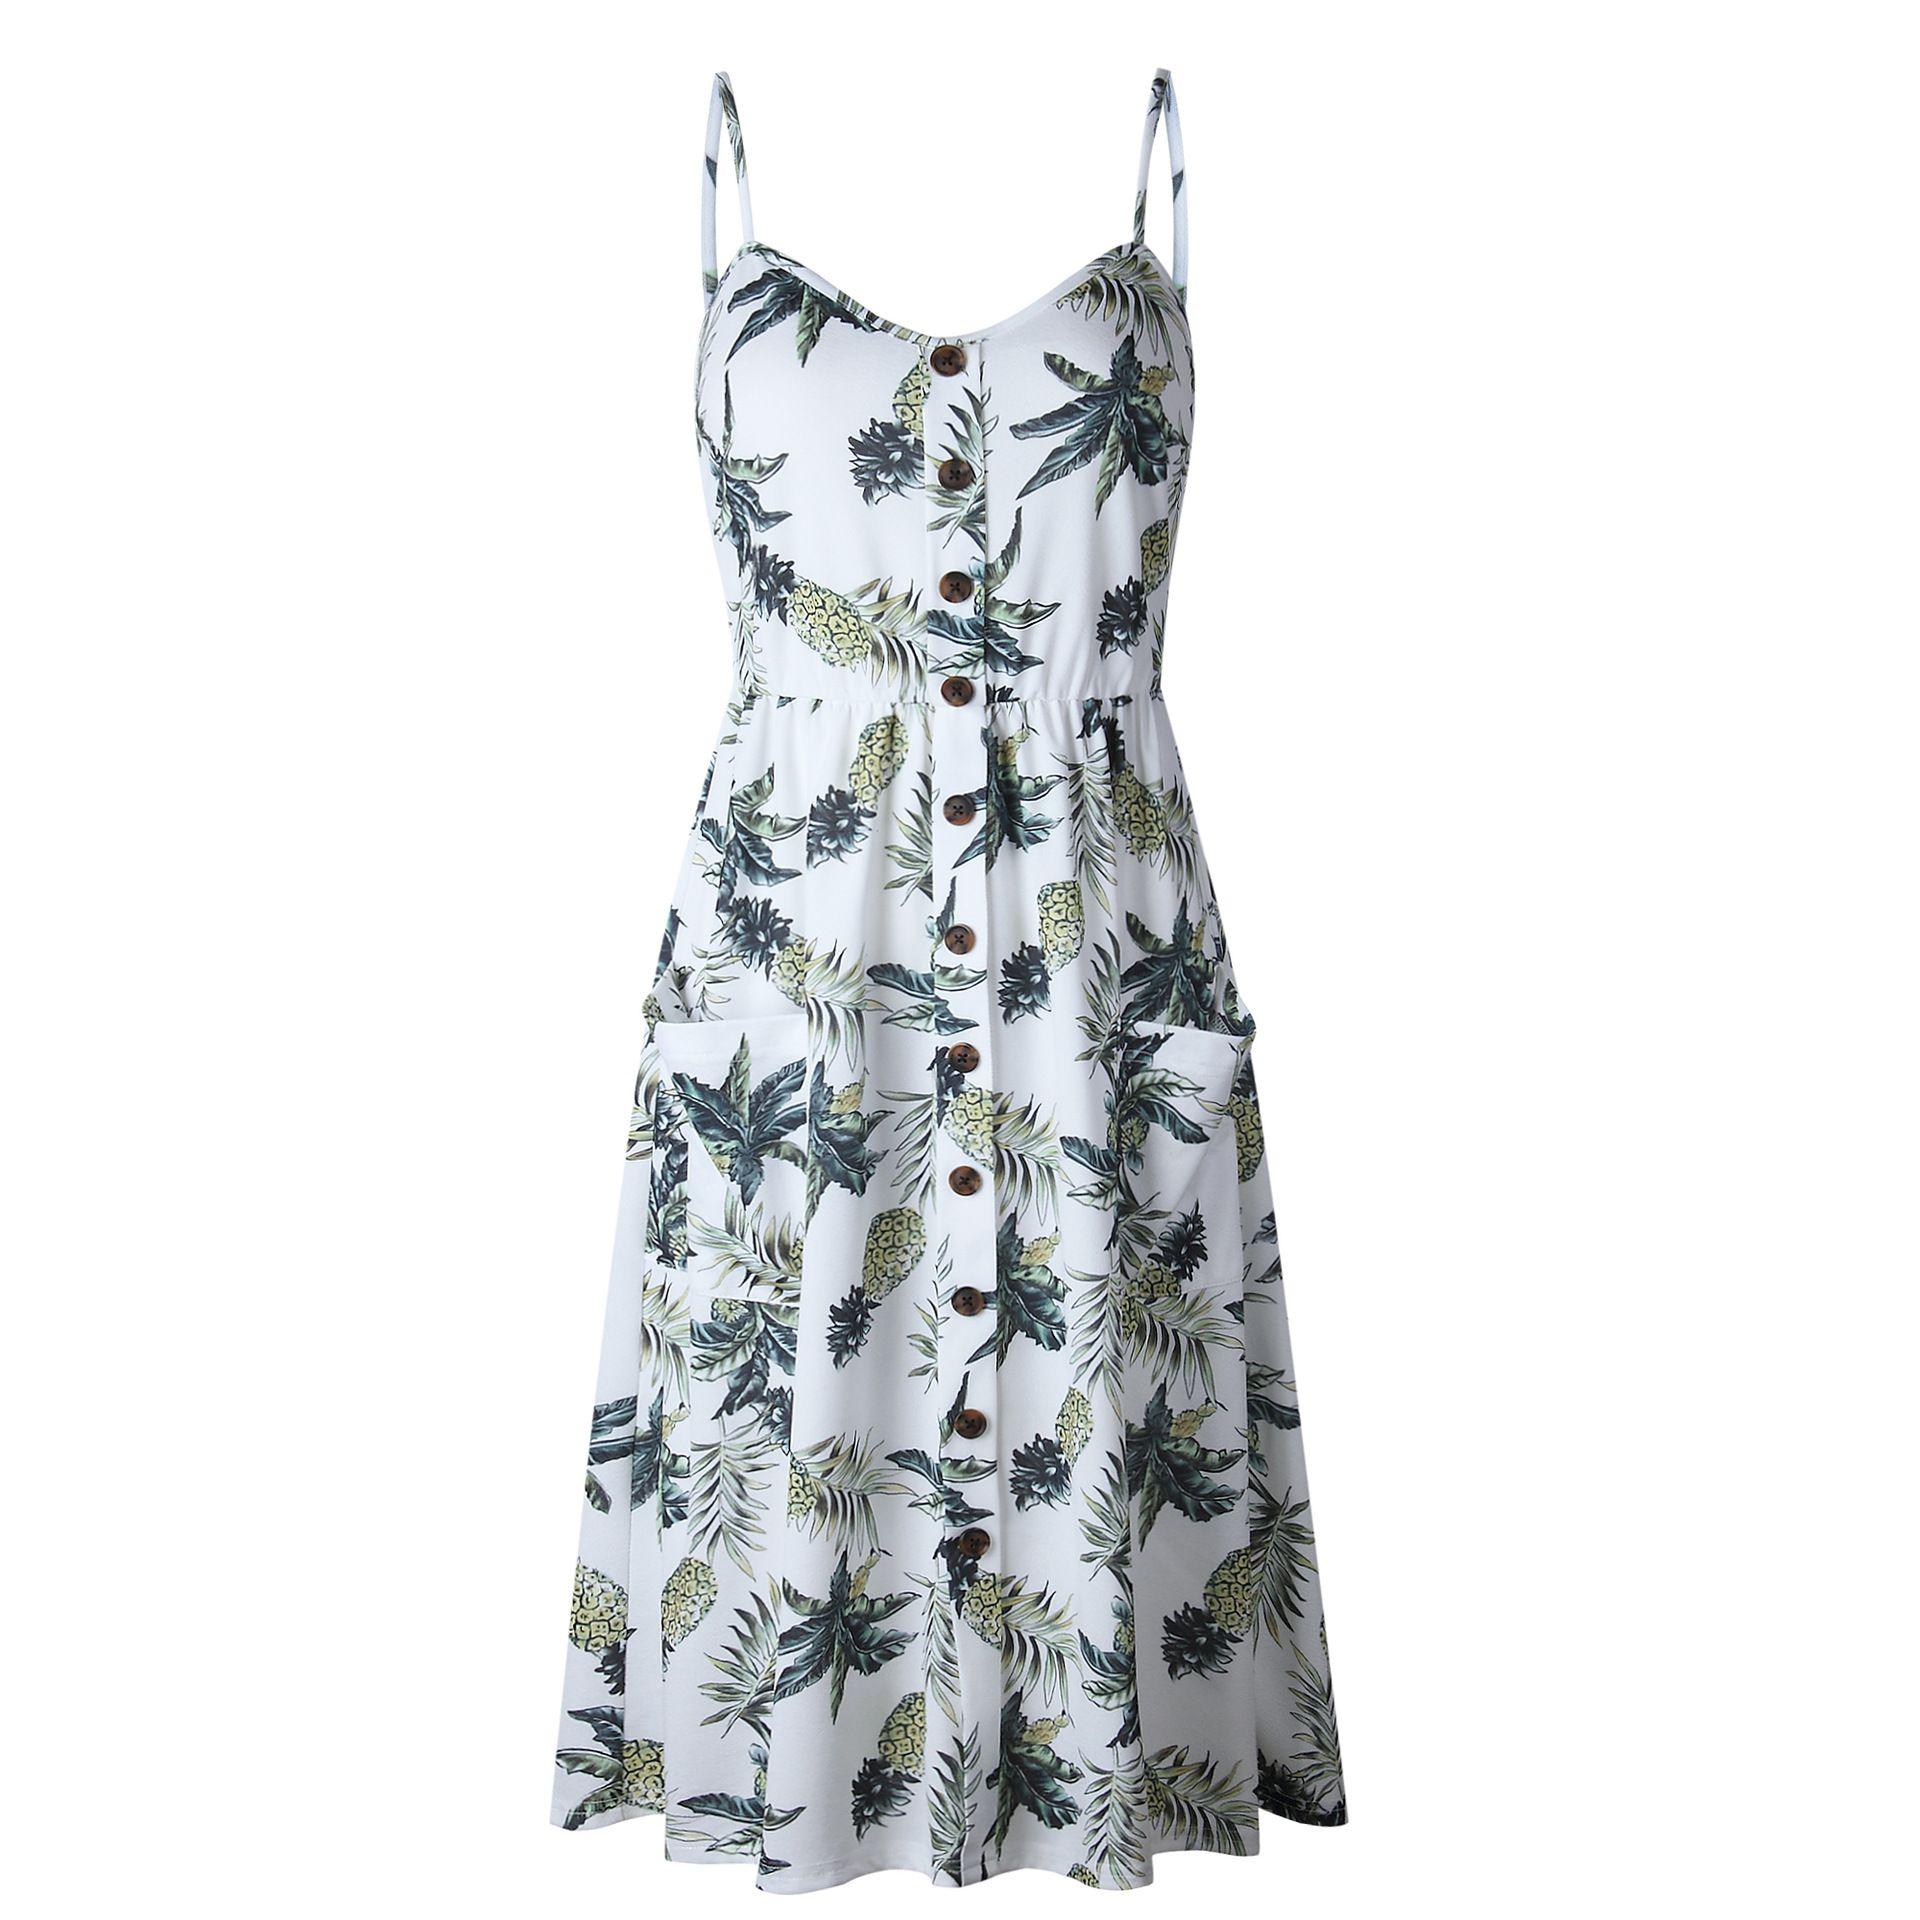 2b2d789b3fec Boho Floral Print Summer Dress Women V Neck Pockets Sleeveless Midi Dresses  Female Sunflower Pleated Backless Button Sexy Dress-in Dresses from Women's  ...